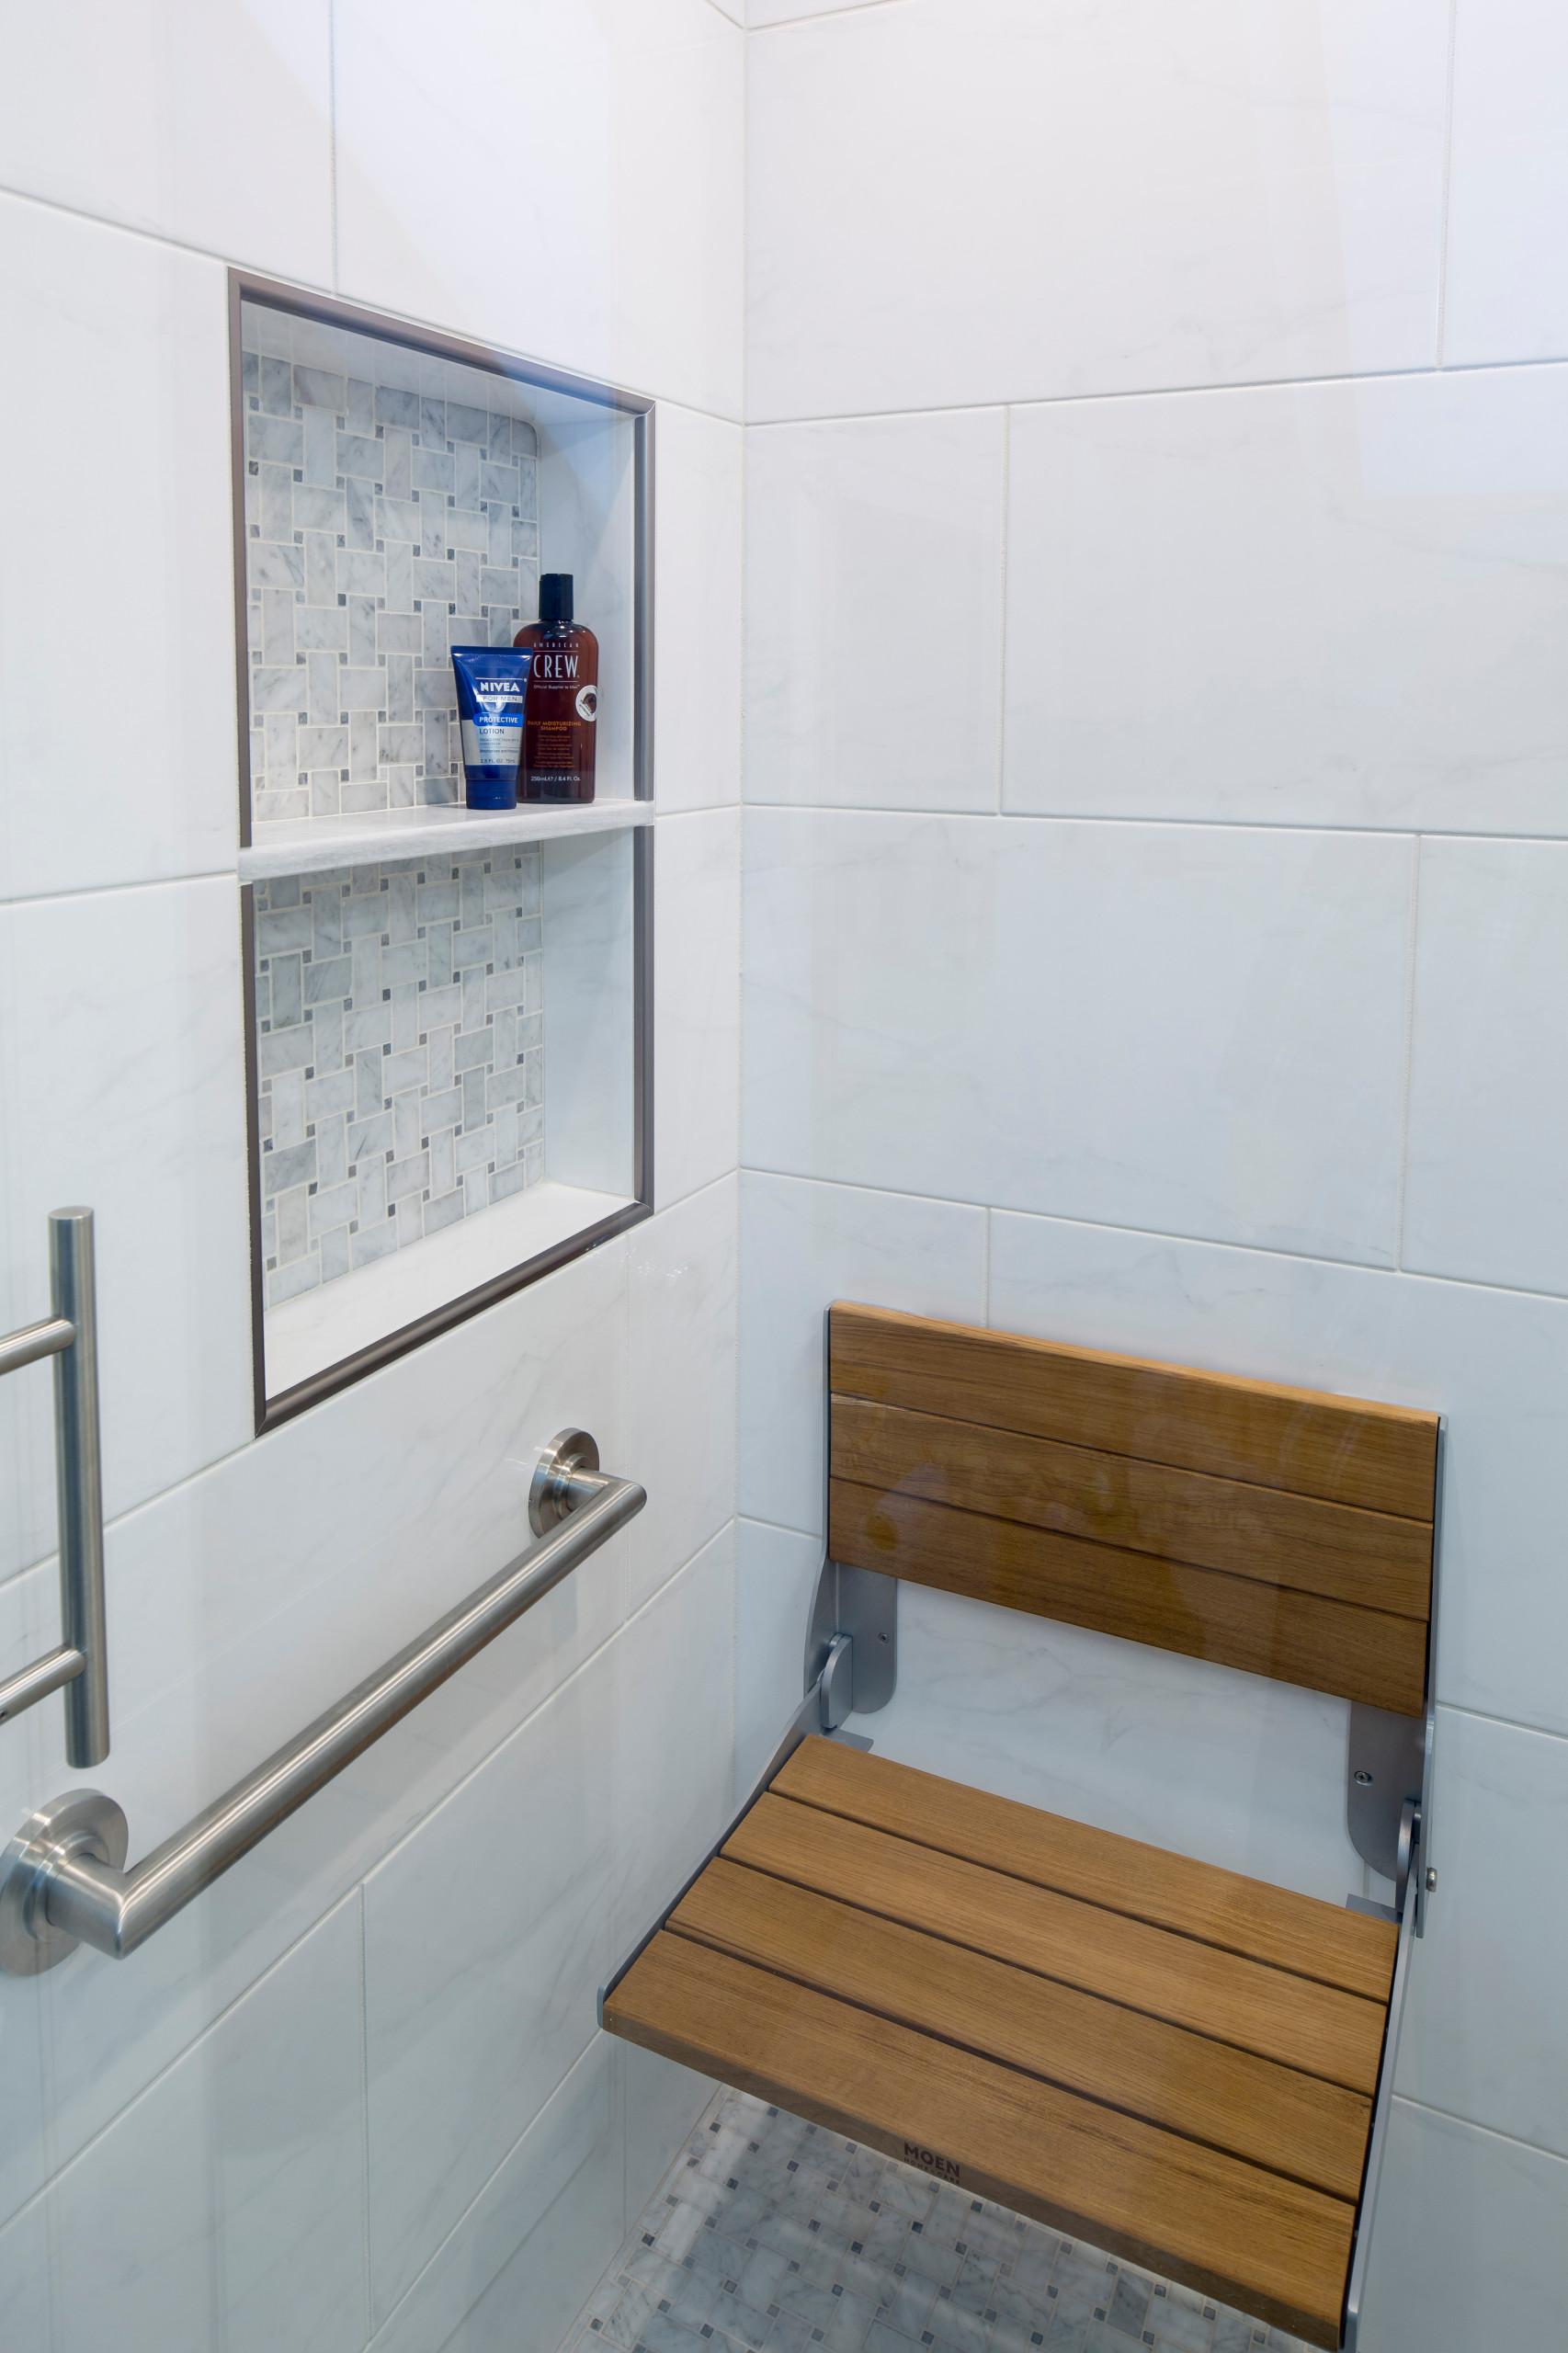 C.B.'s Bath- His